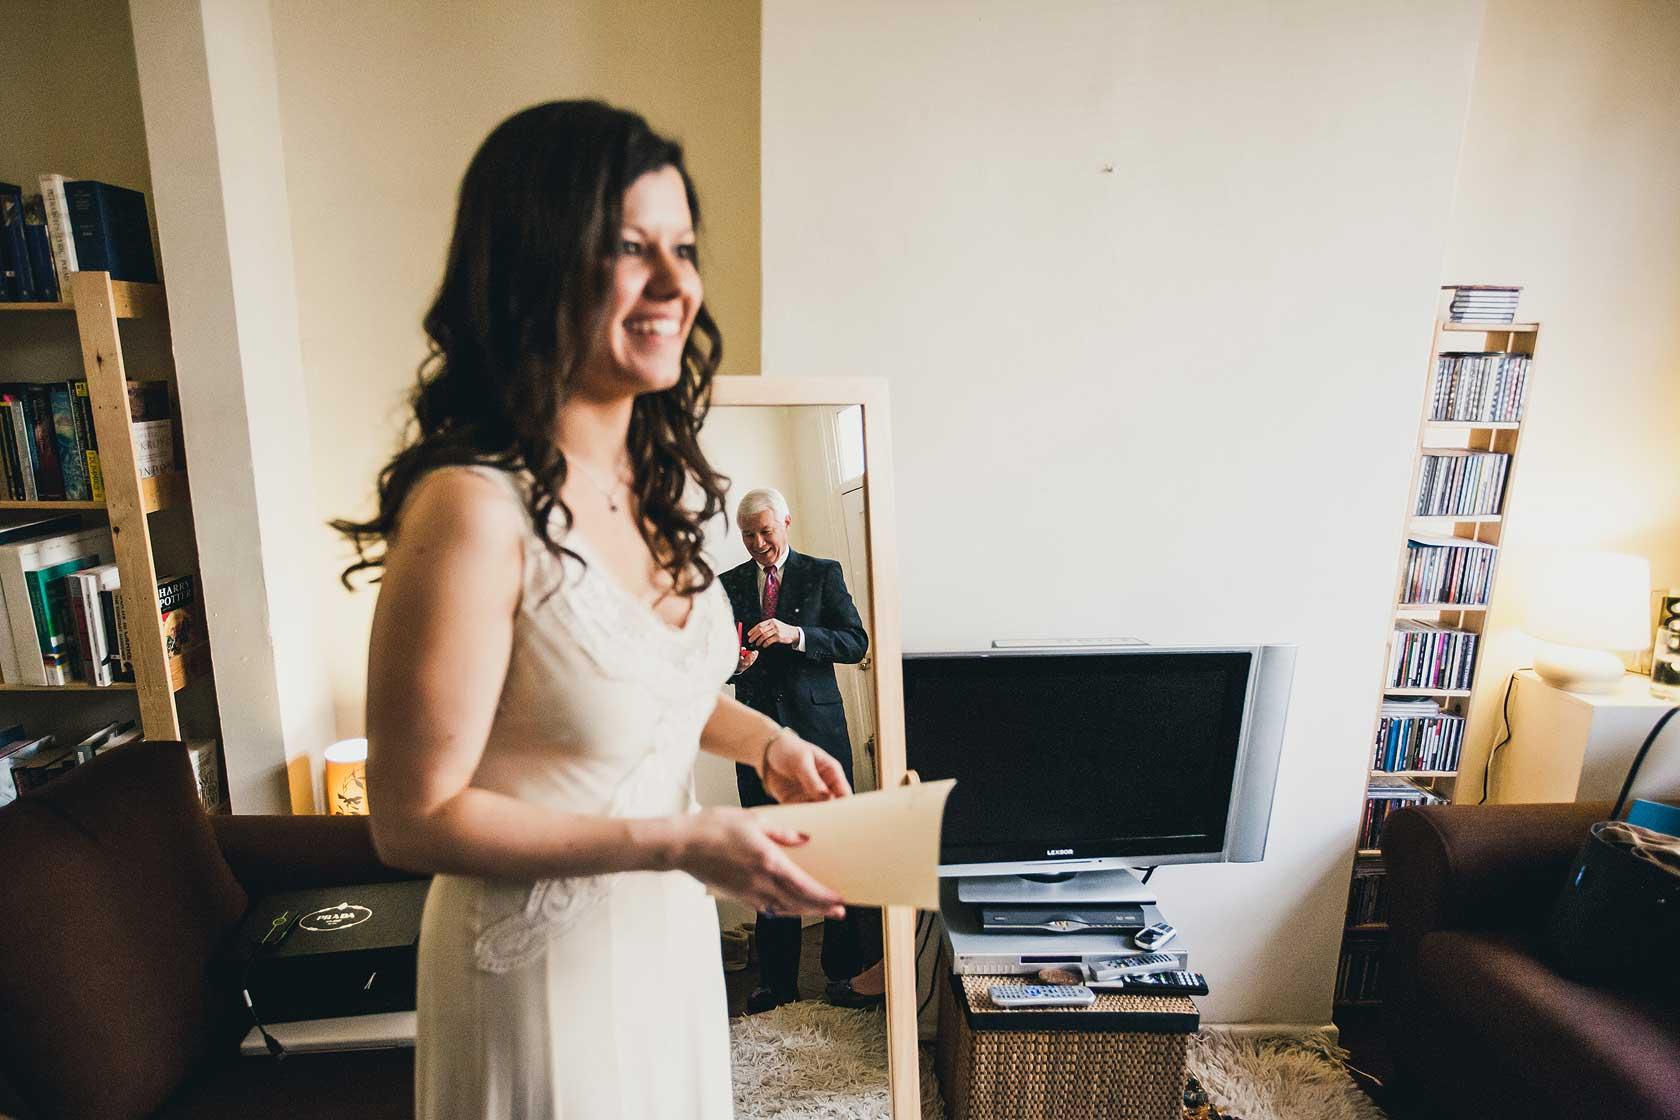 Reportage Wedding Photography at Girton College